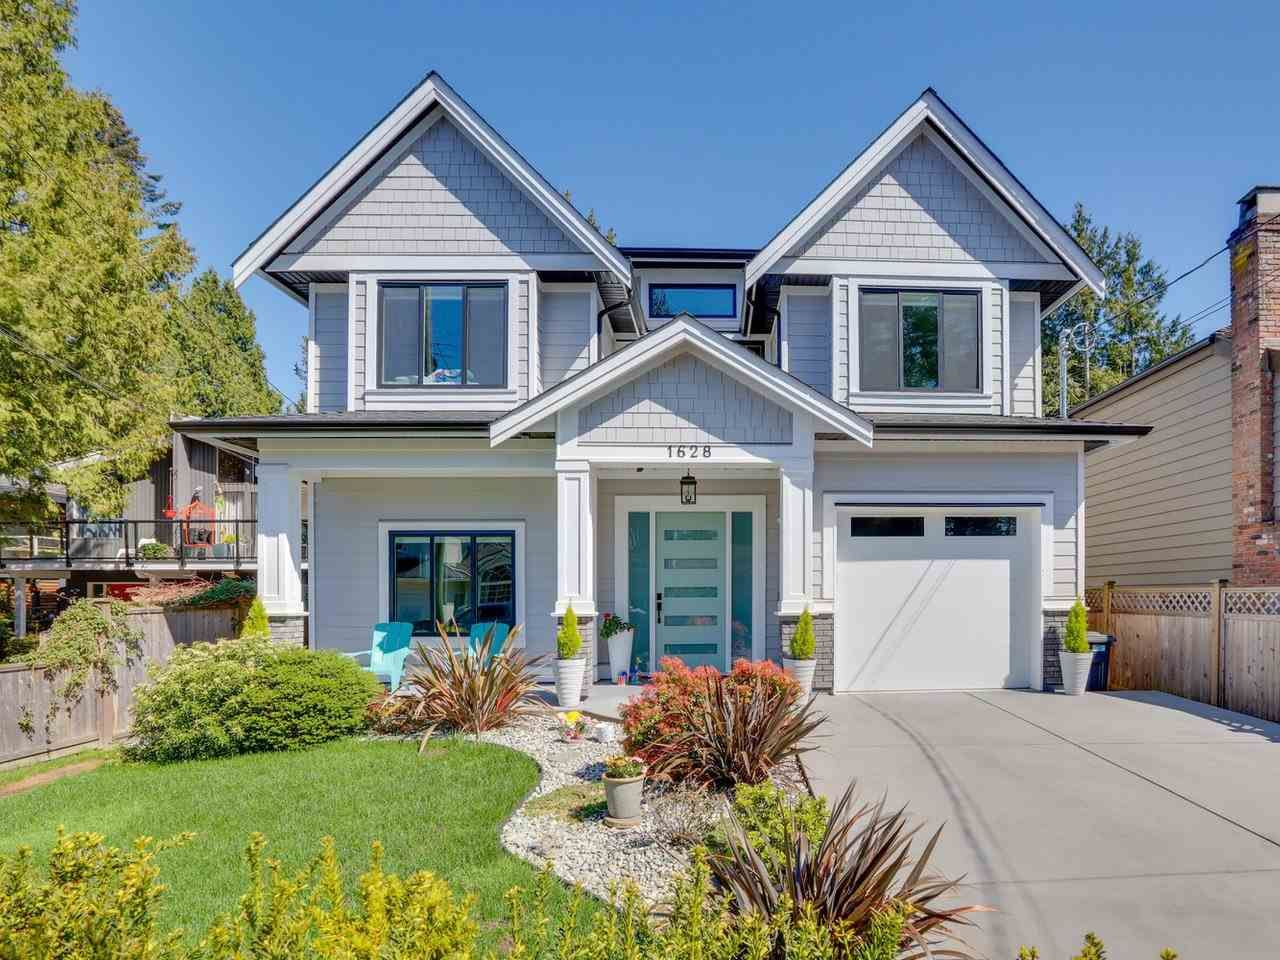 Main Photo: 1628 FARRELL Crescent in Delta: Beach Grove House for sale (Tsawwassen)  : MLS®# R2571389